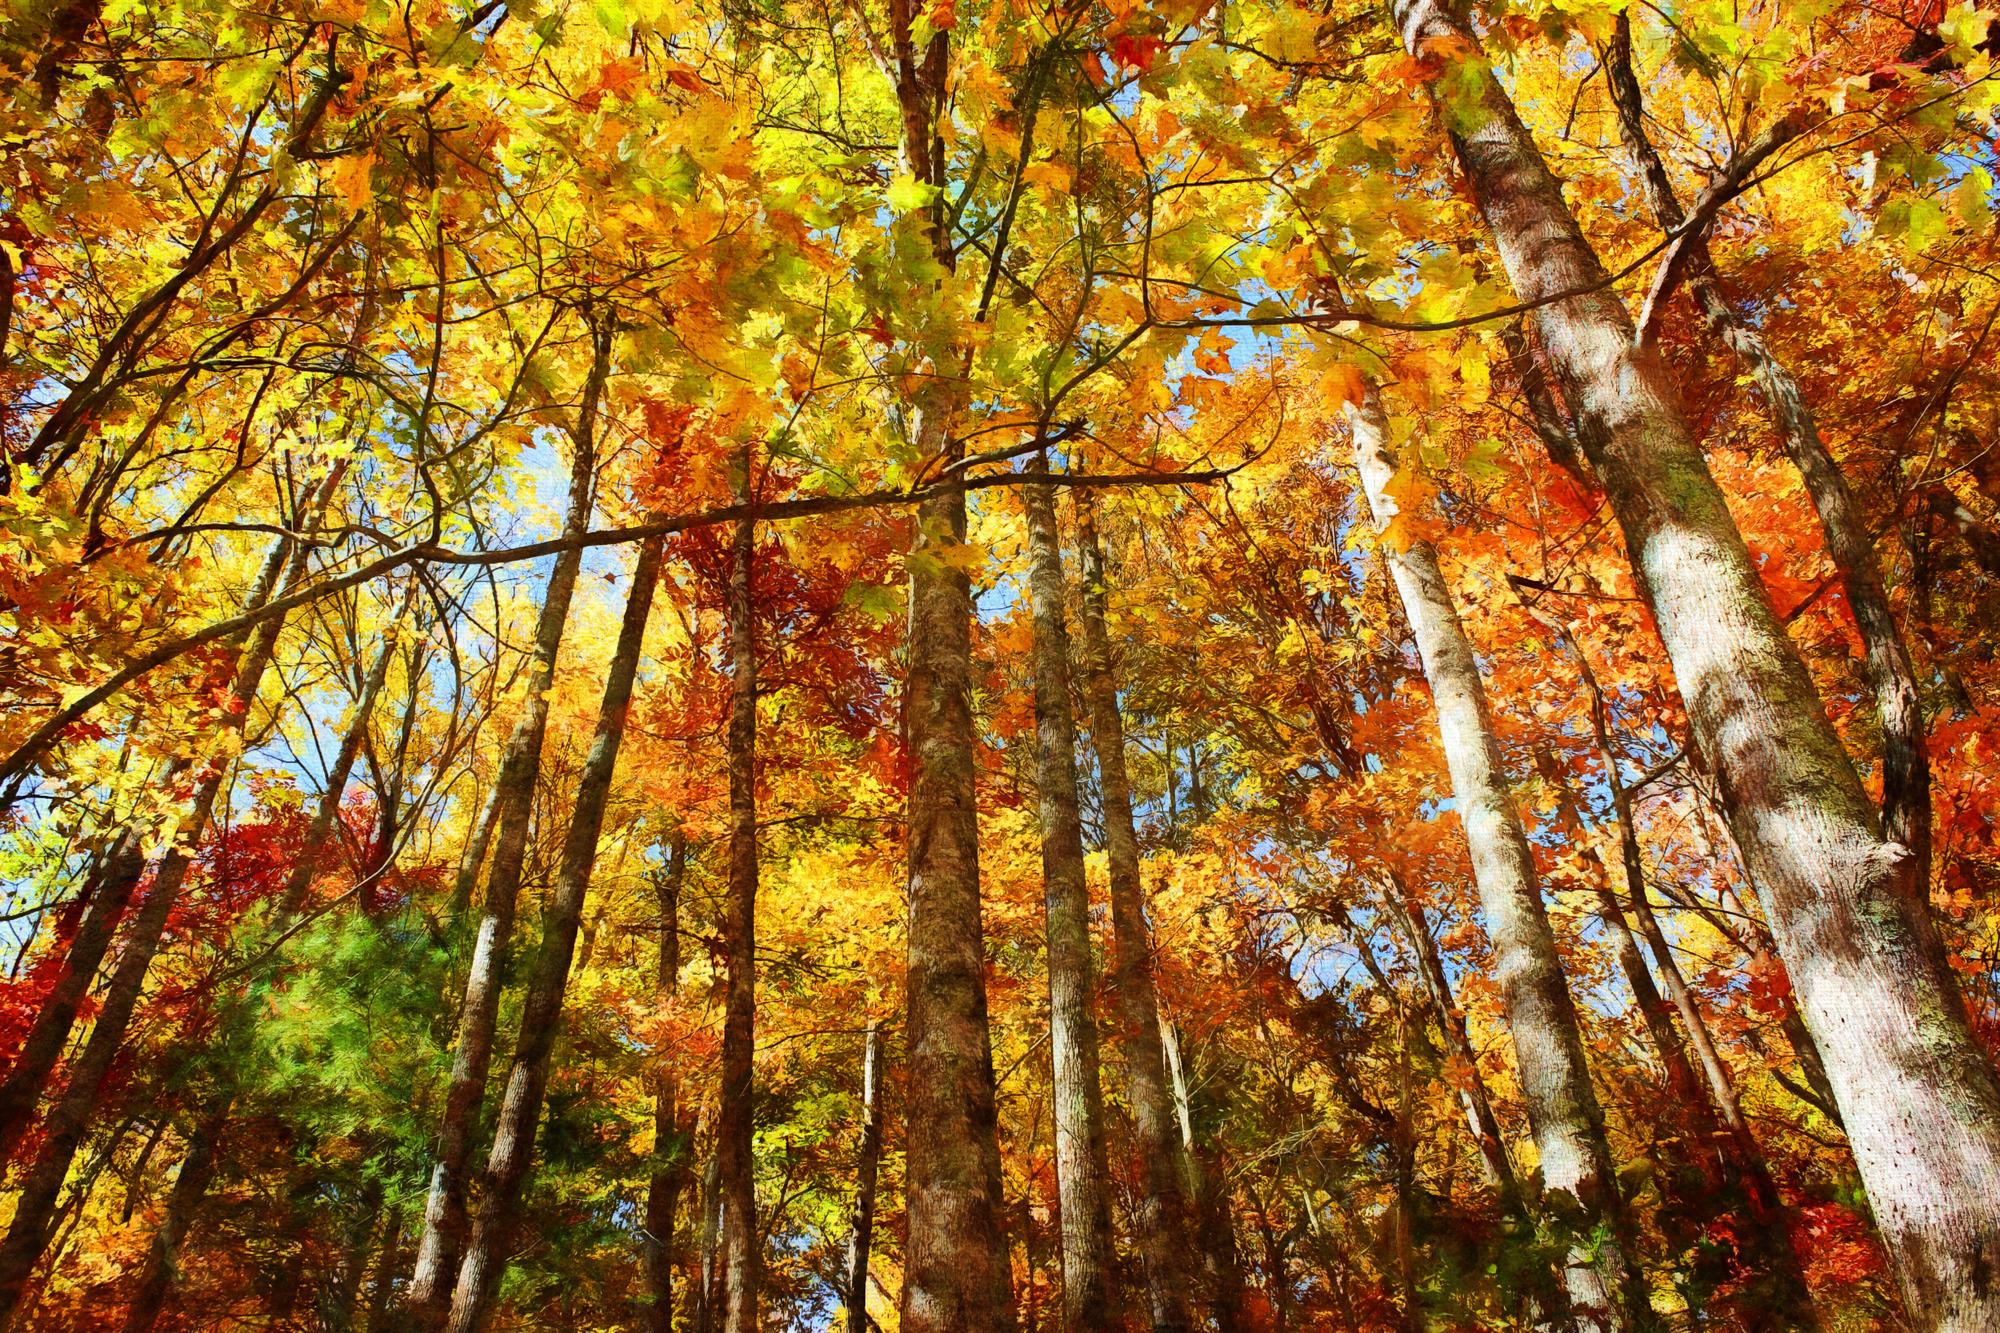 Fall Colors Painted-239.jpg